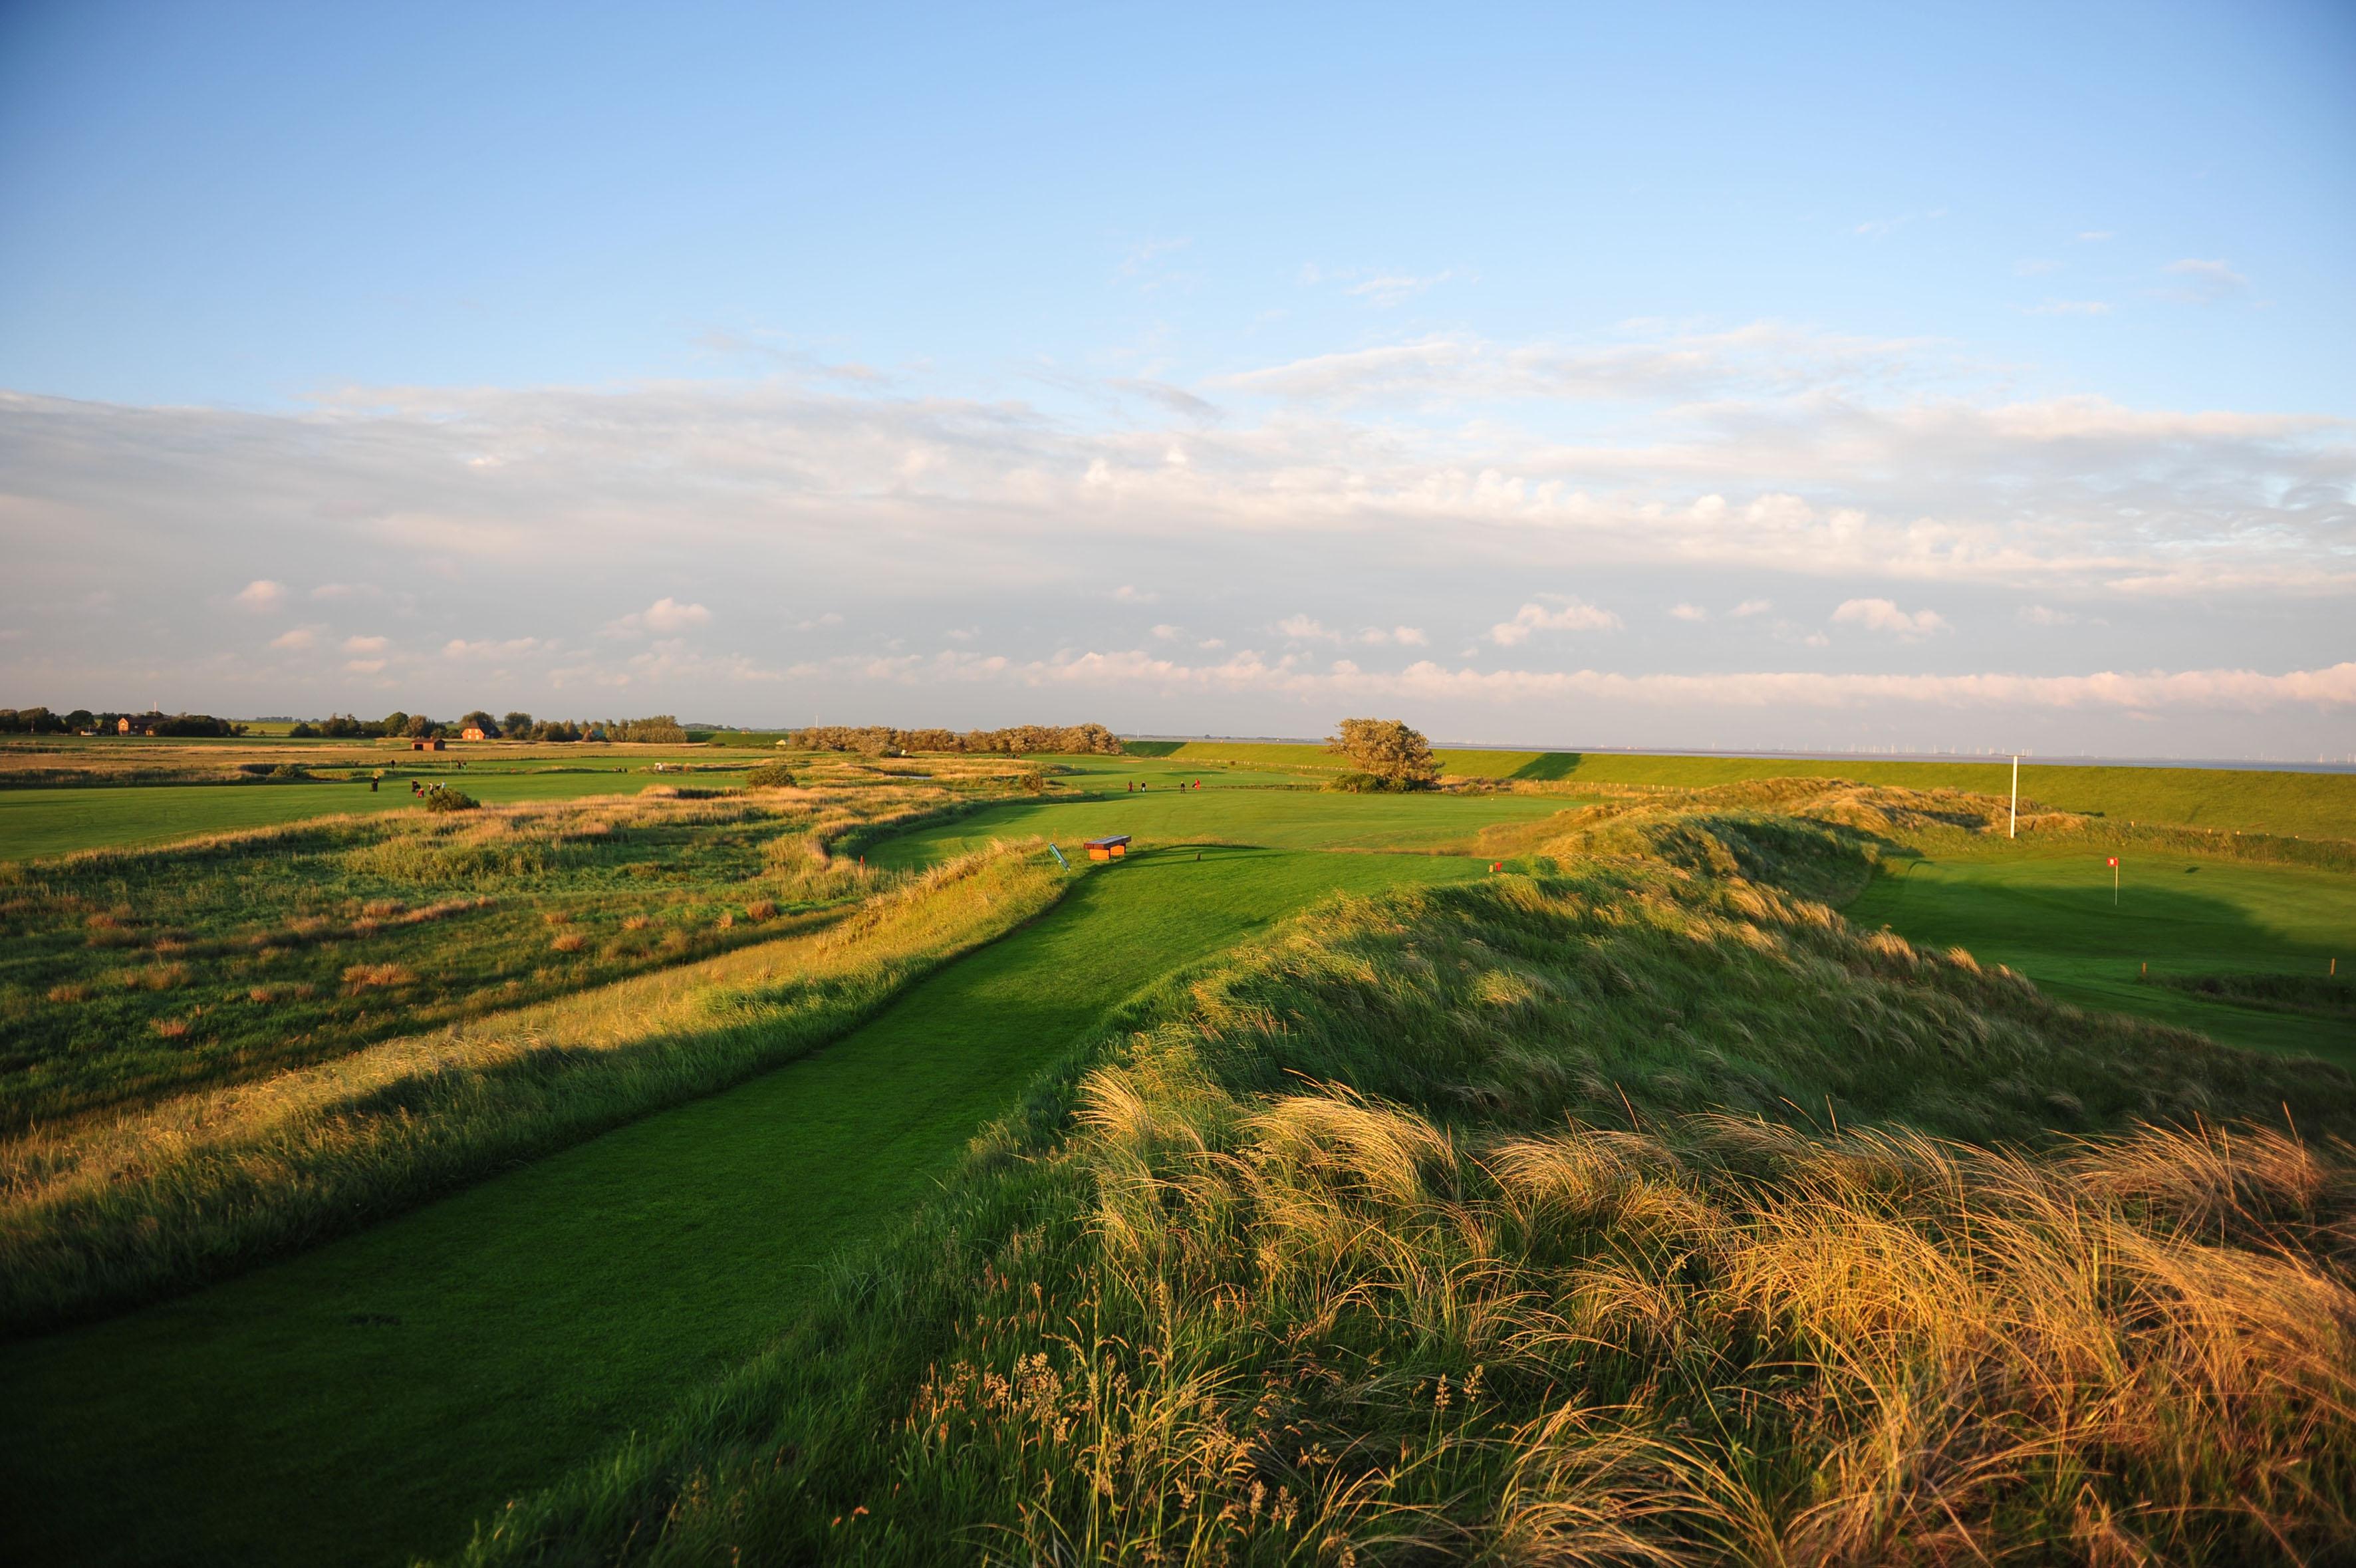 nordsee-golf-club_spo